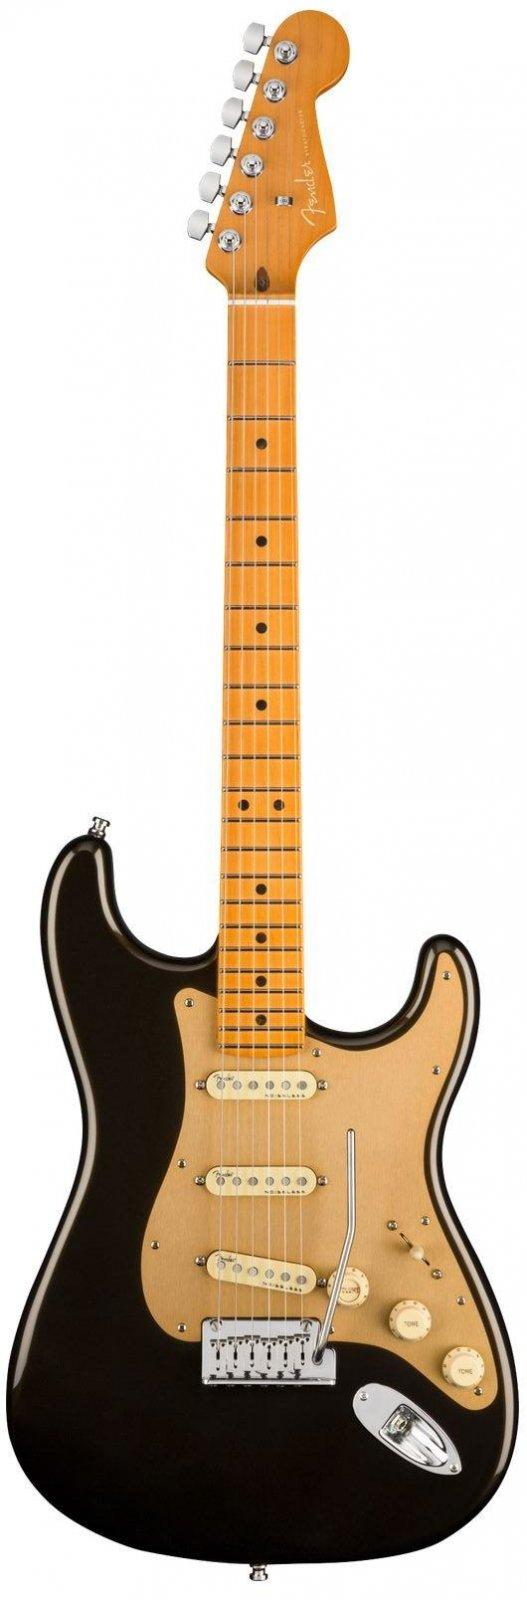 Fender 0118012790 American Ultra Stratocaster, Maple Fingerboard - Texas Tea